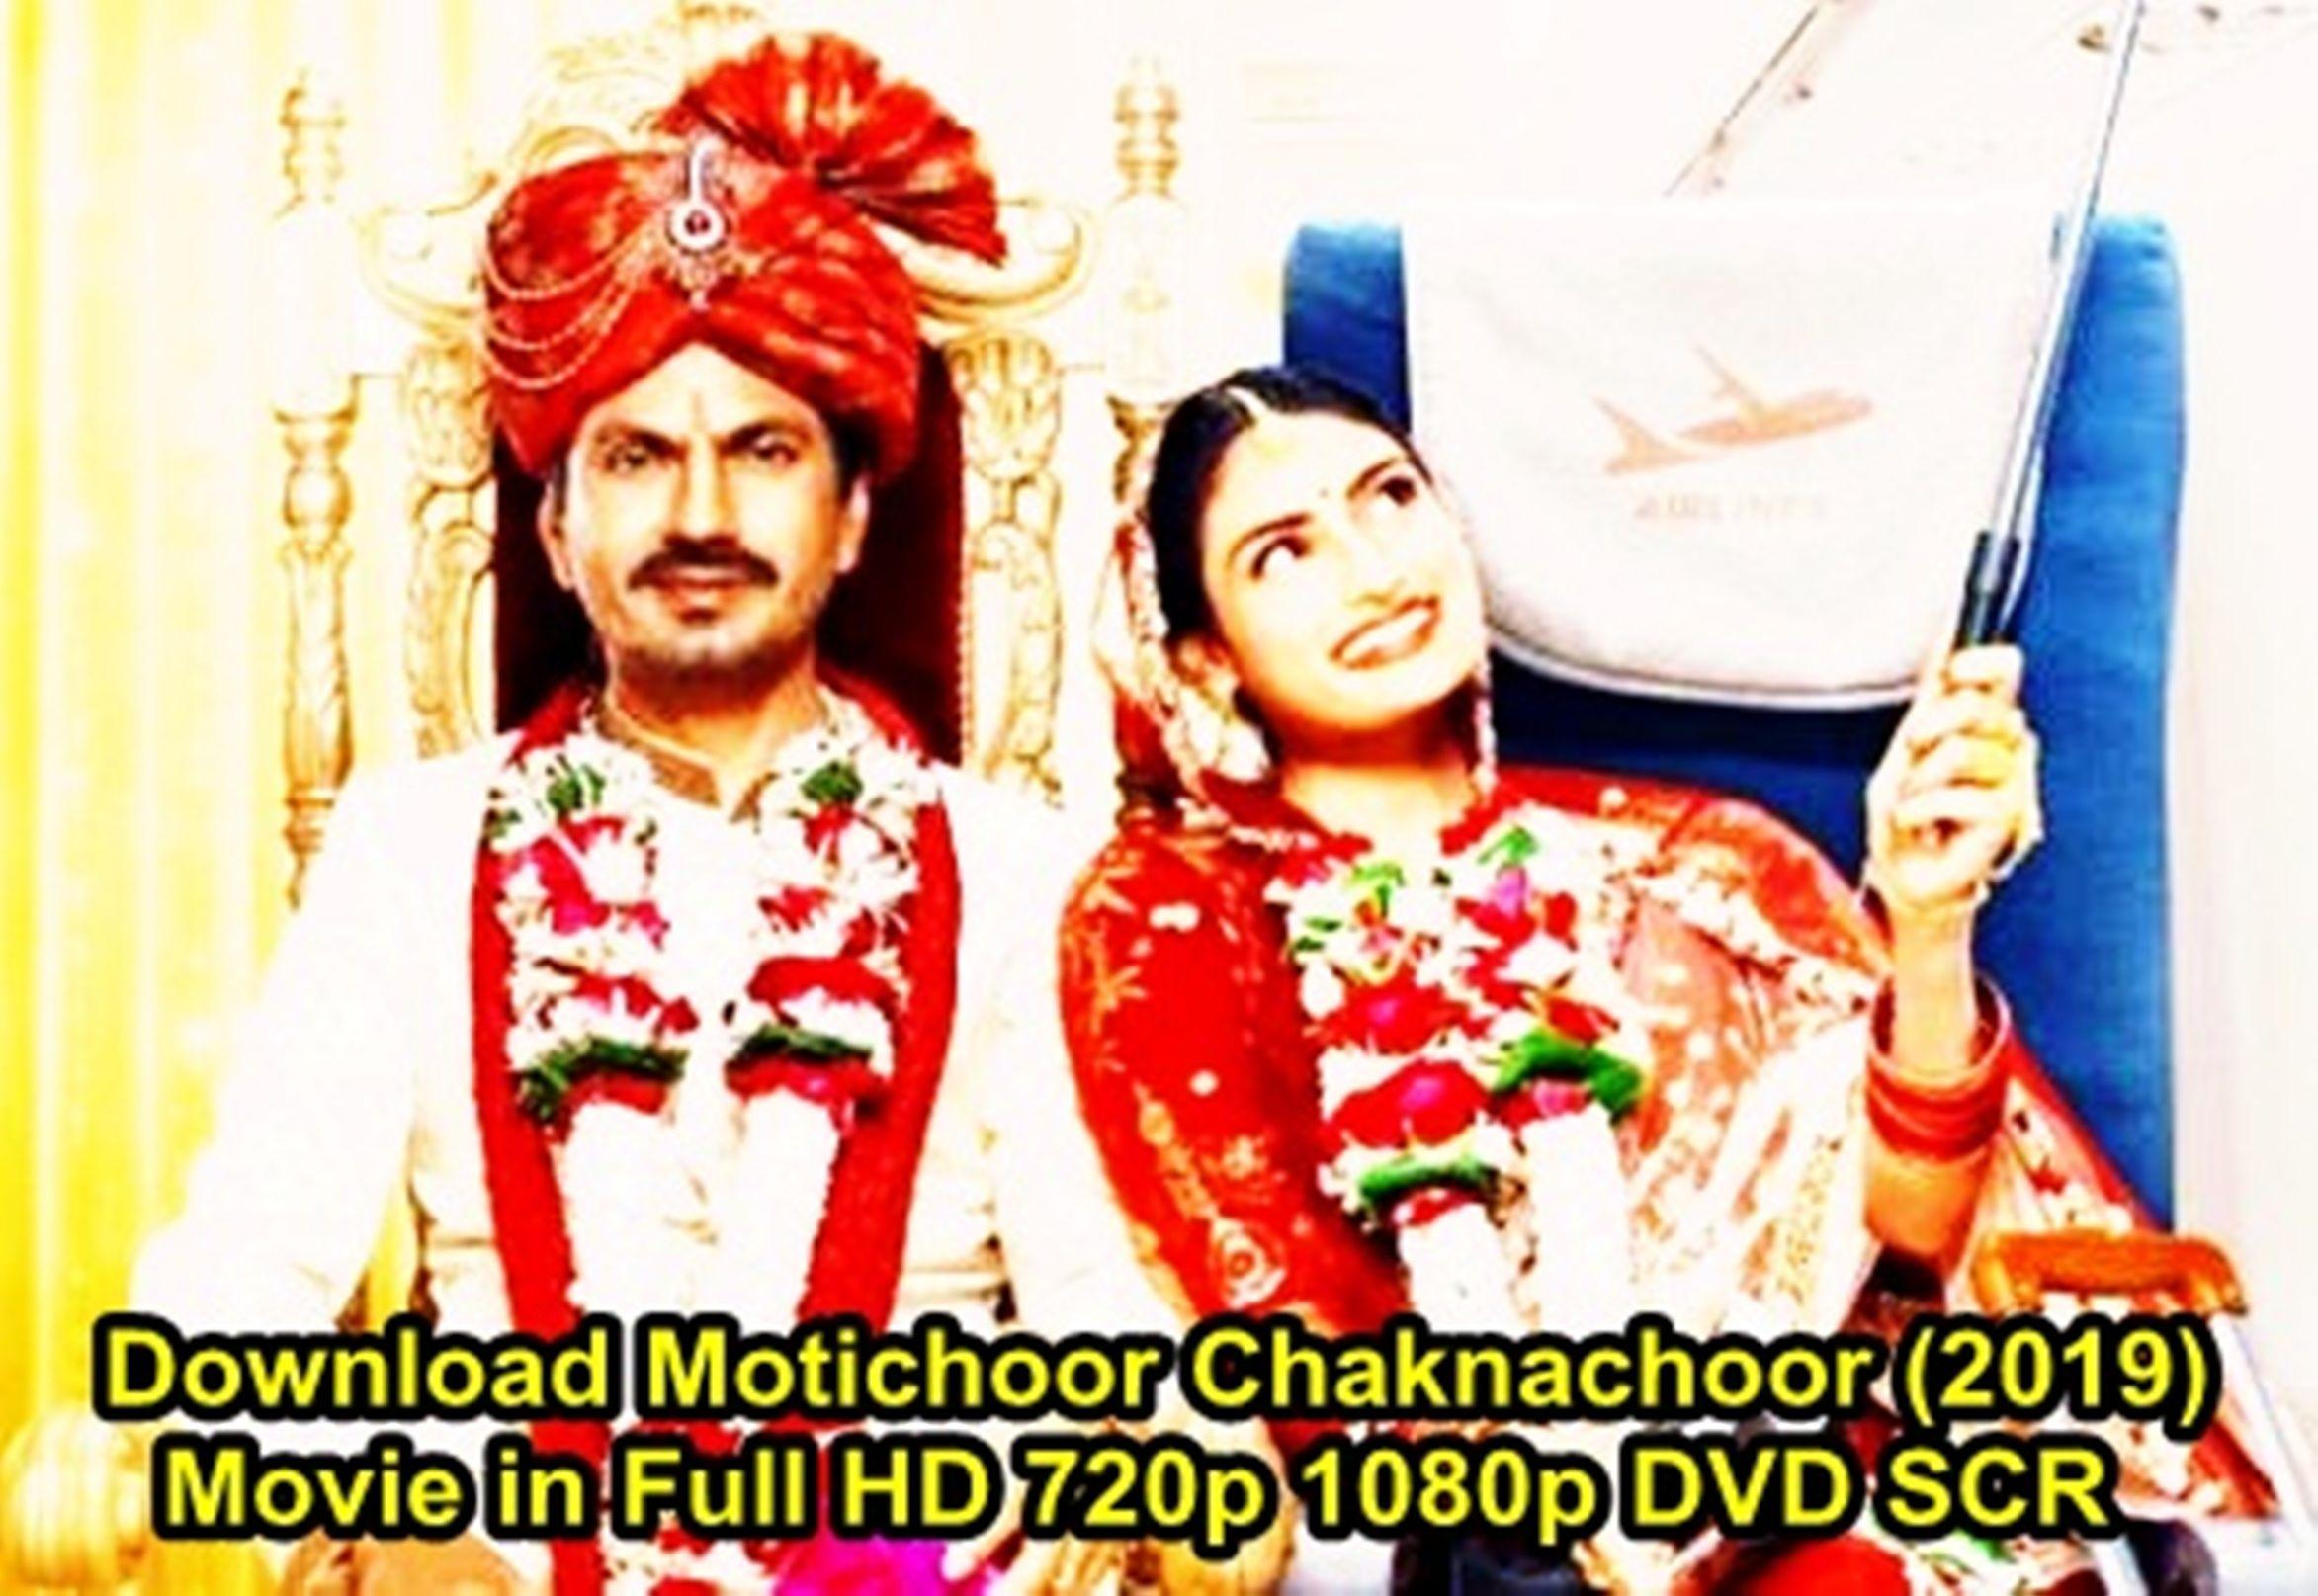 Download Motichoor Chaknachoor 2019 Movie In Full Hd 720p 1080p Dvd Scr New Movies Download Movies Latest Movies